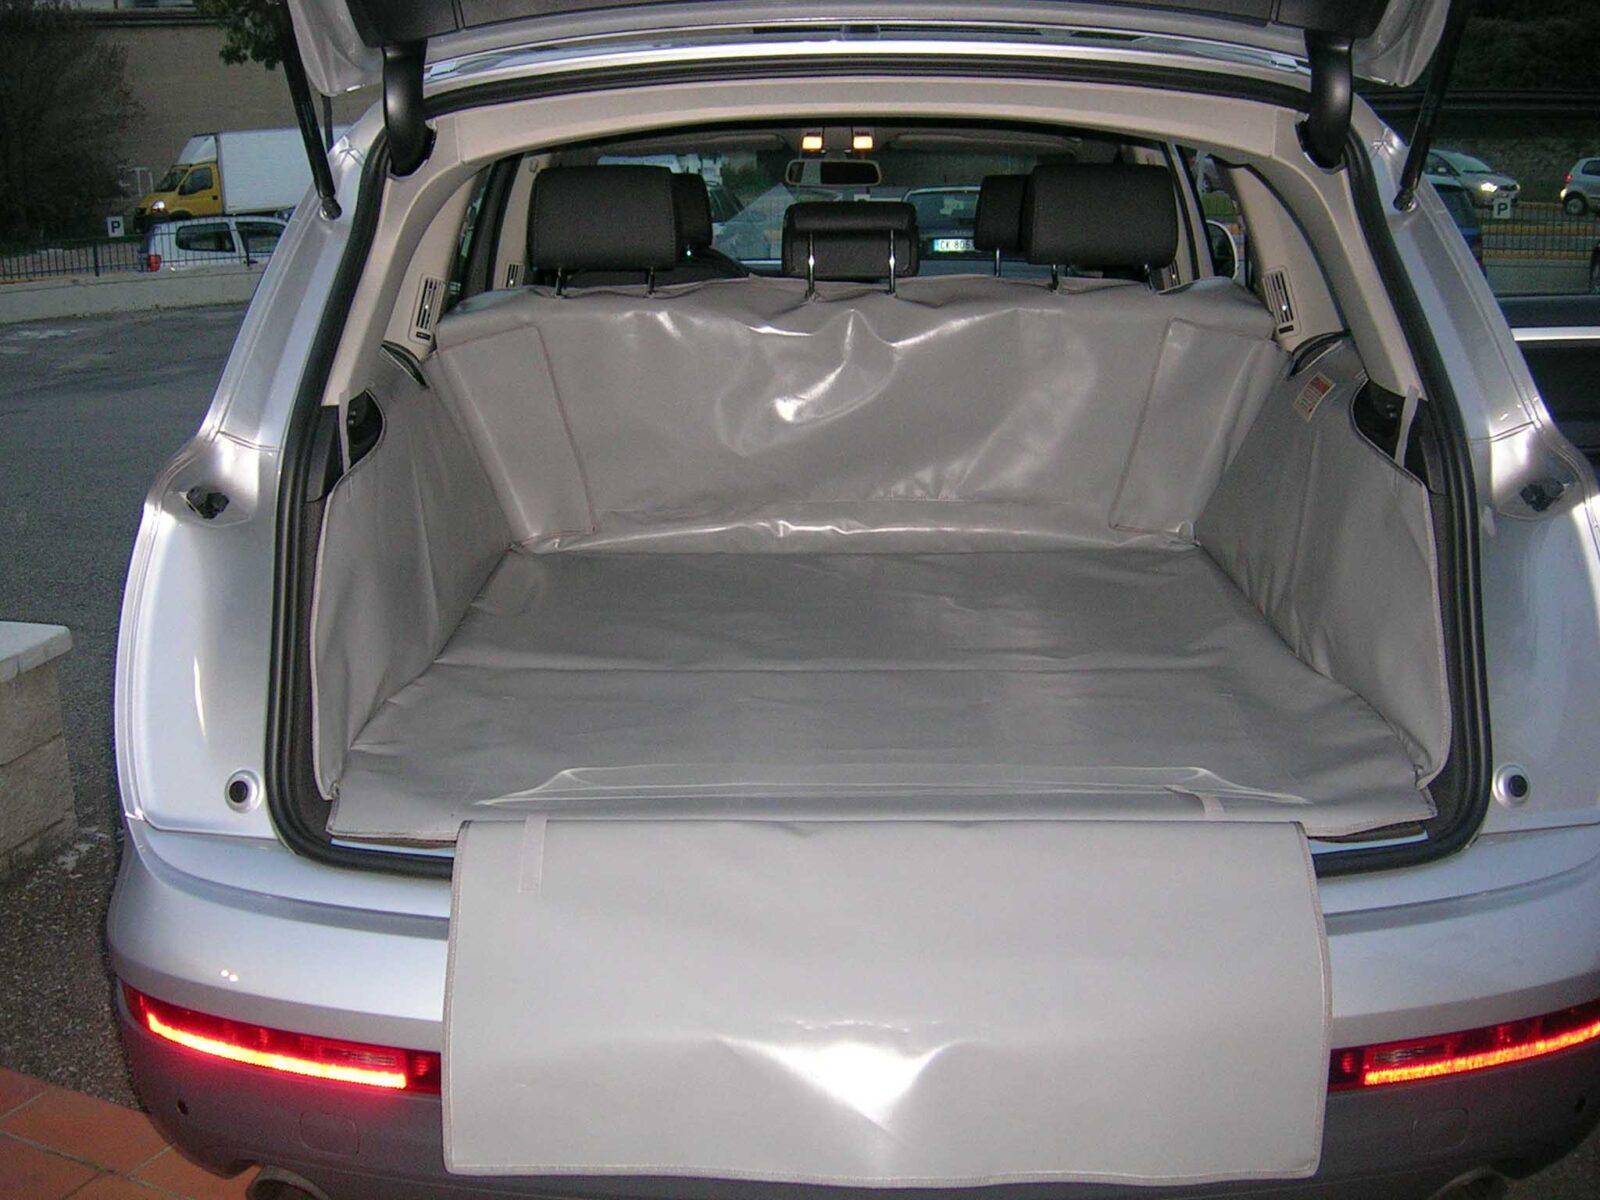 Salva baule Audi Q7 telo cane